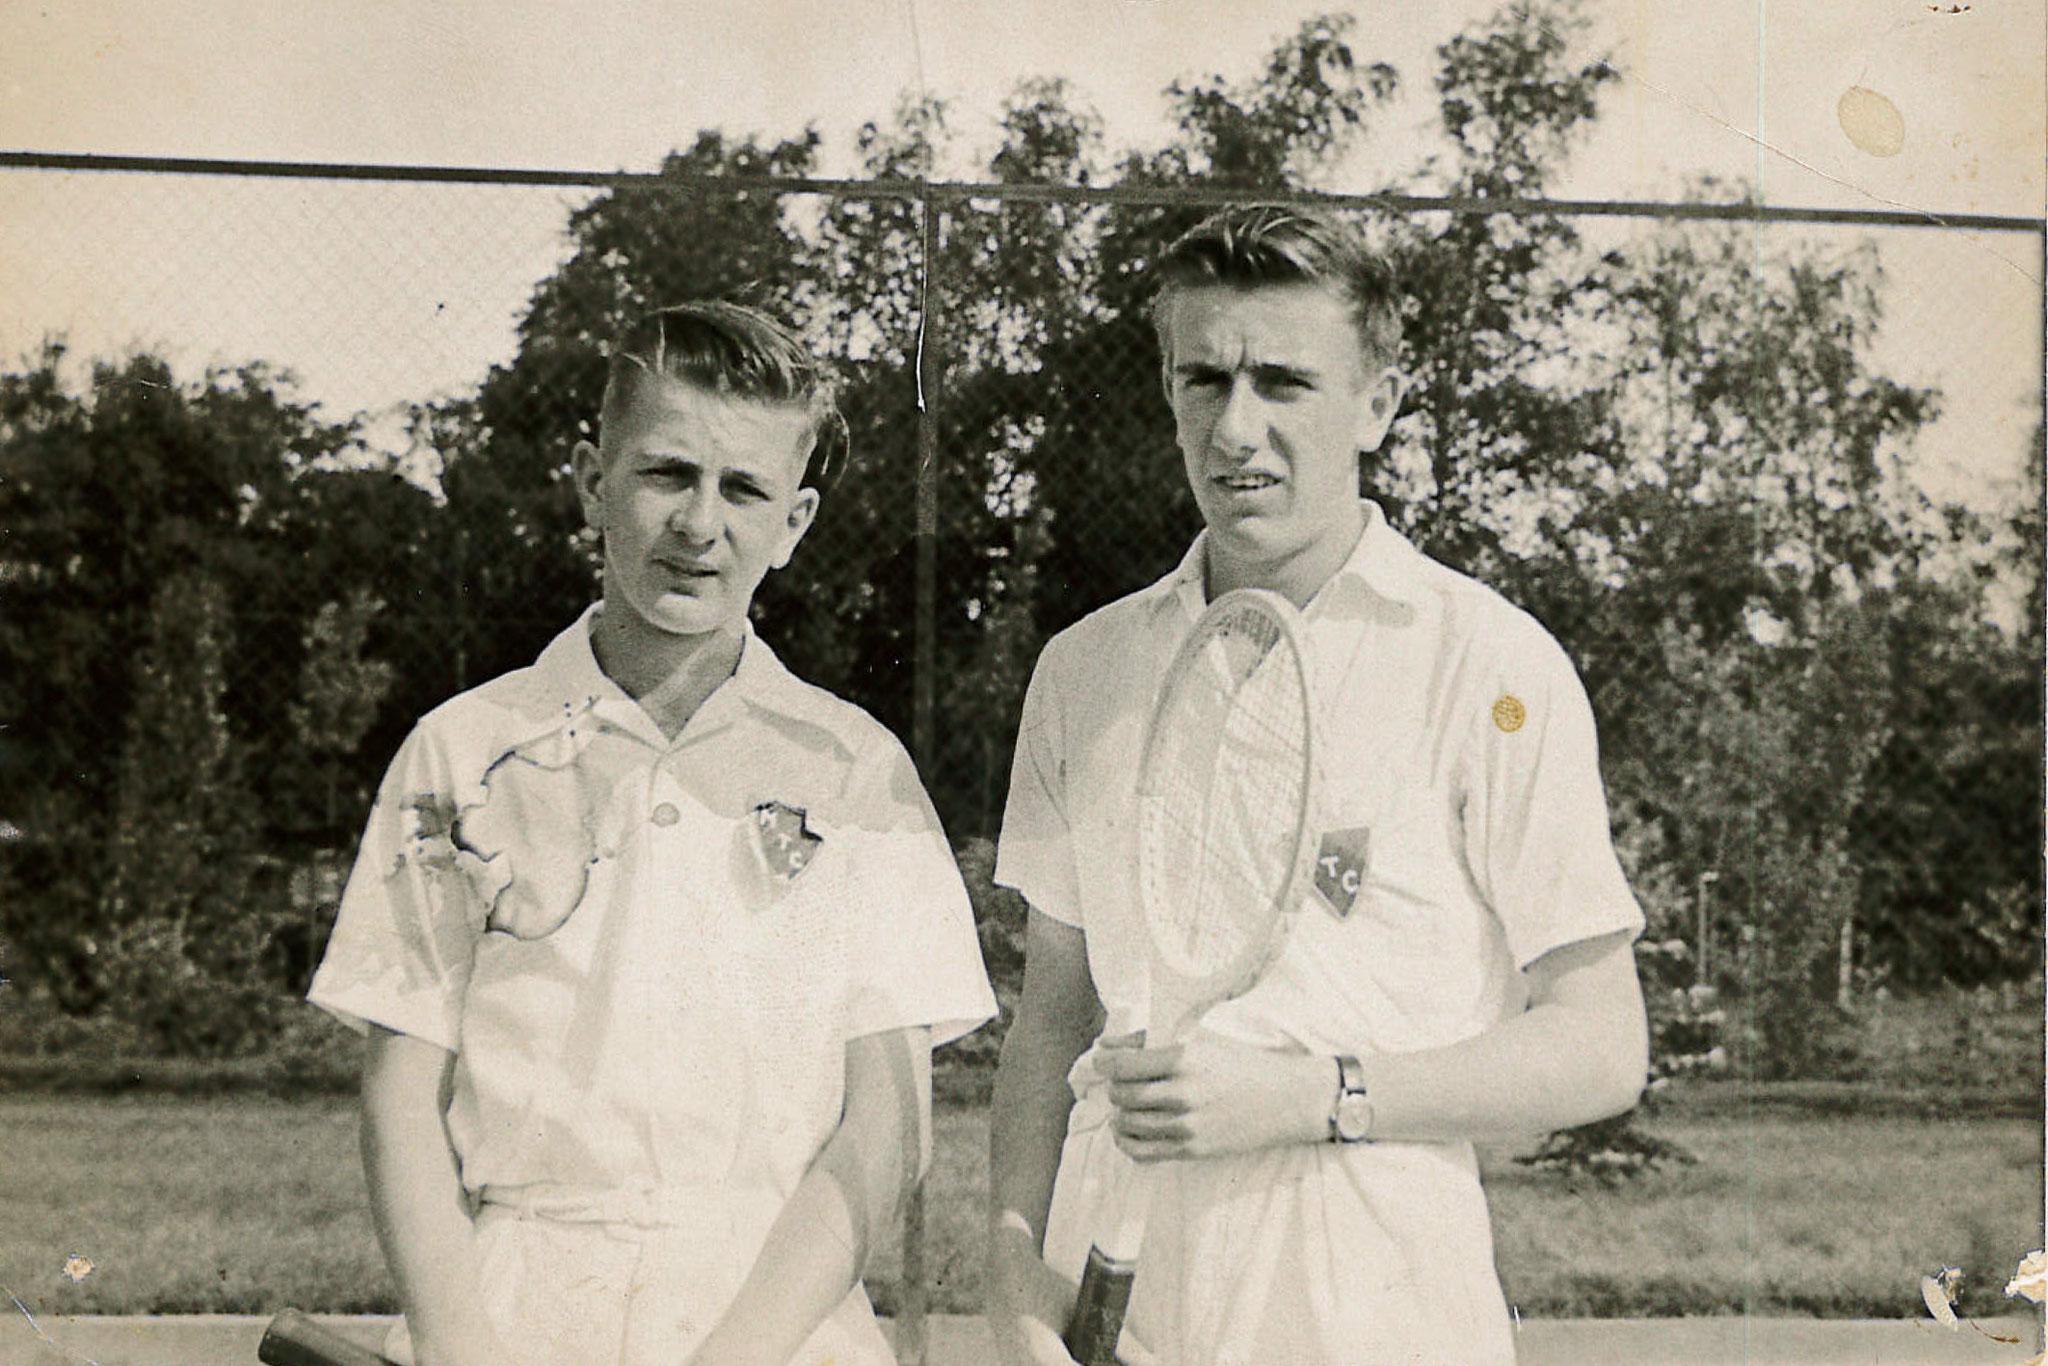 Bernard en Claude Raucy 1953